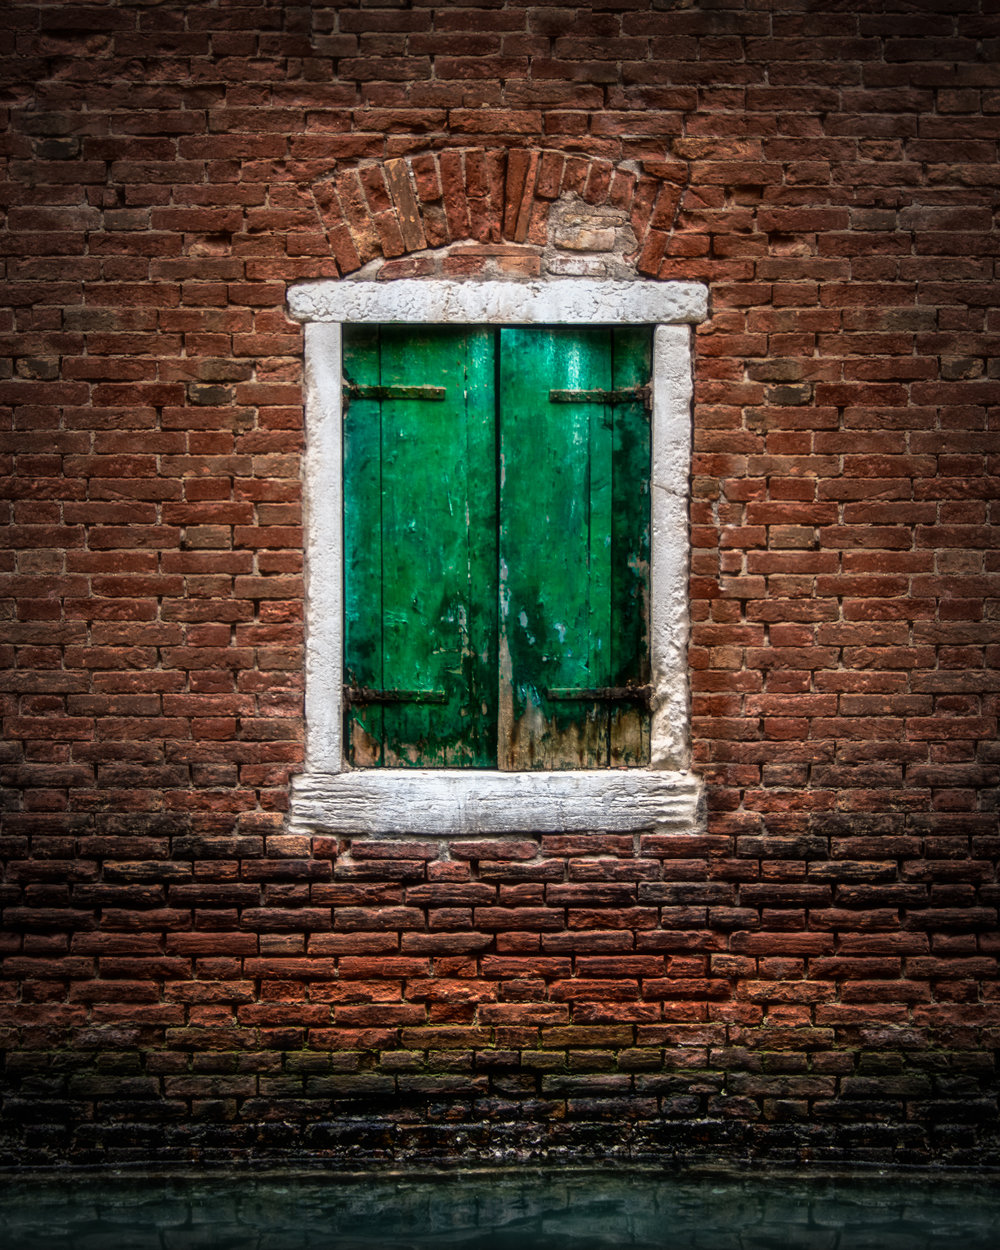 03-Windows-10.jpg